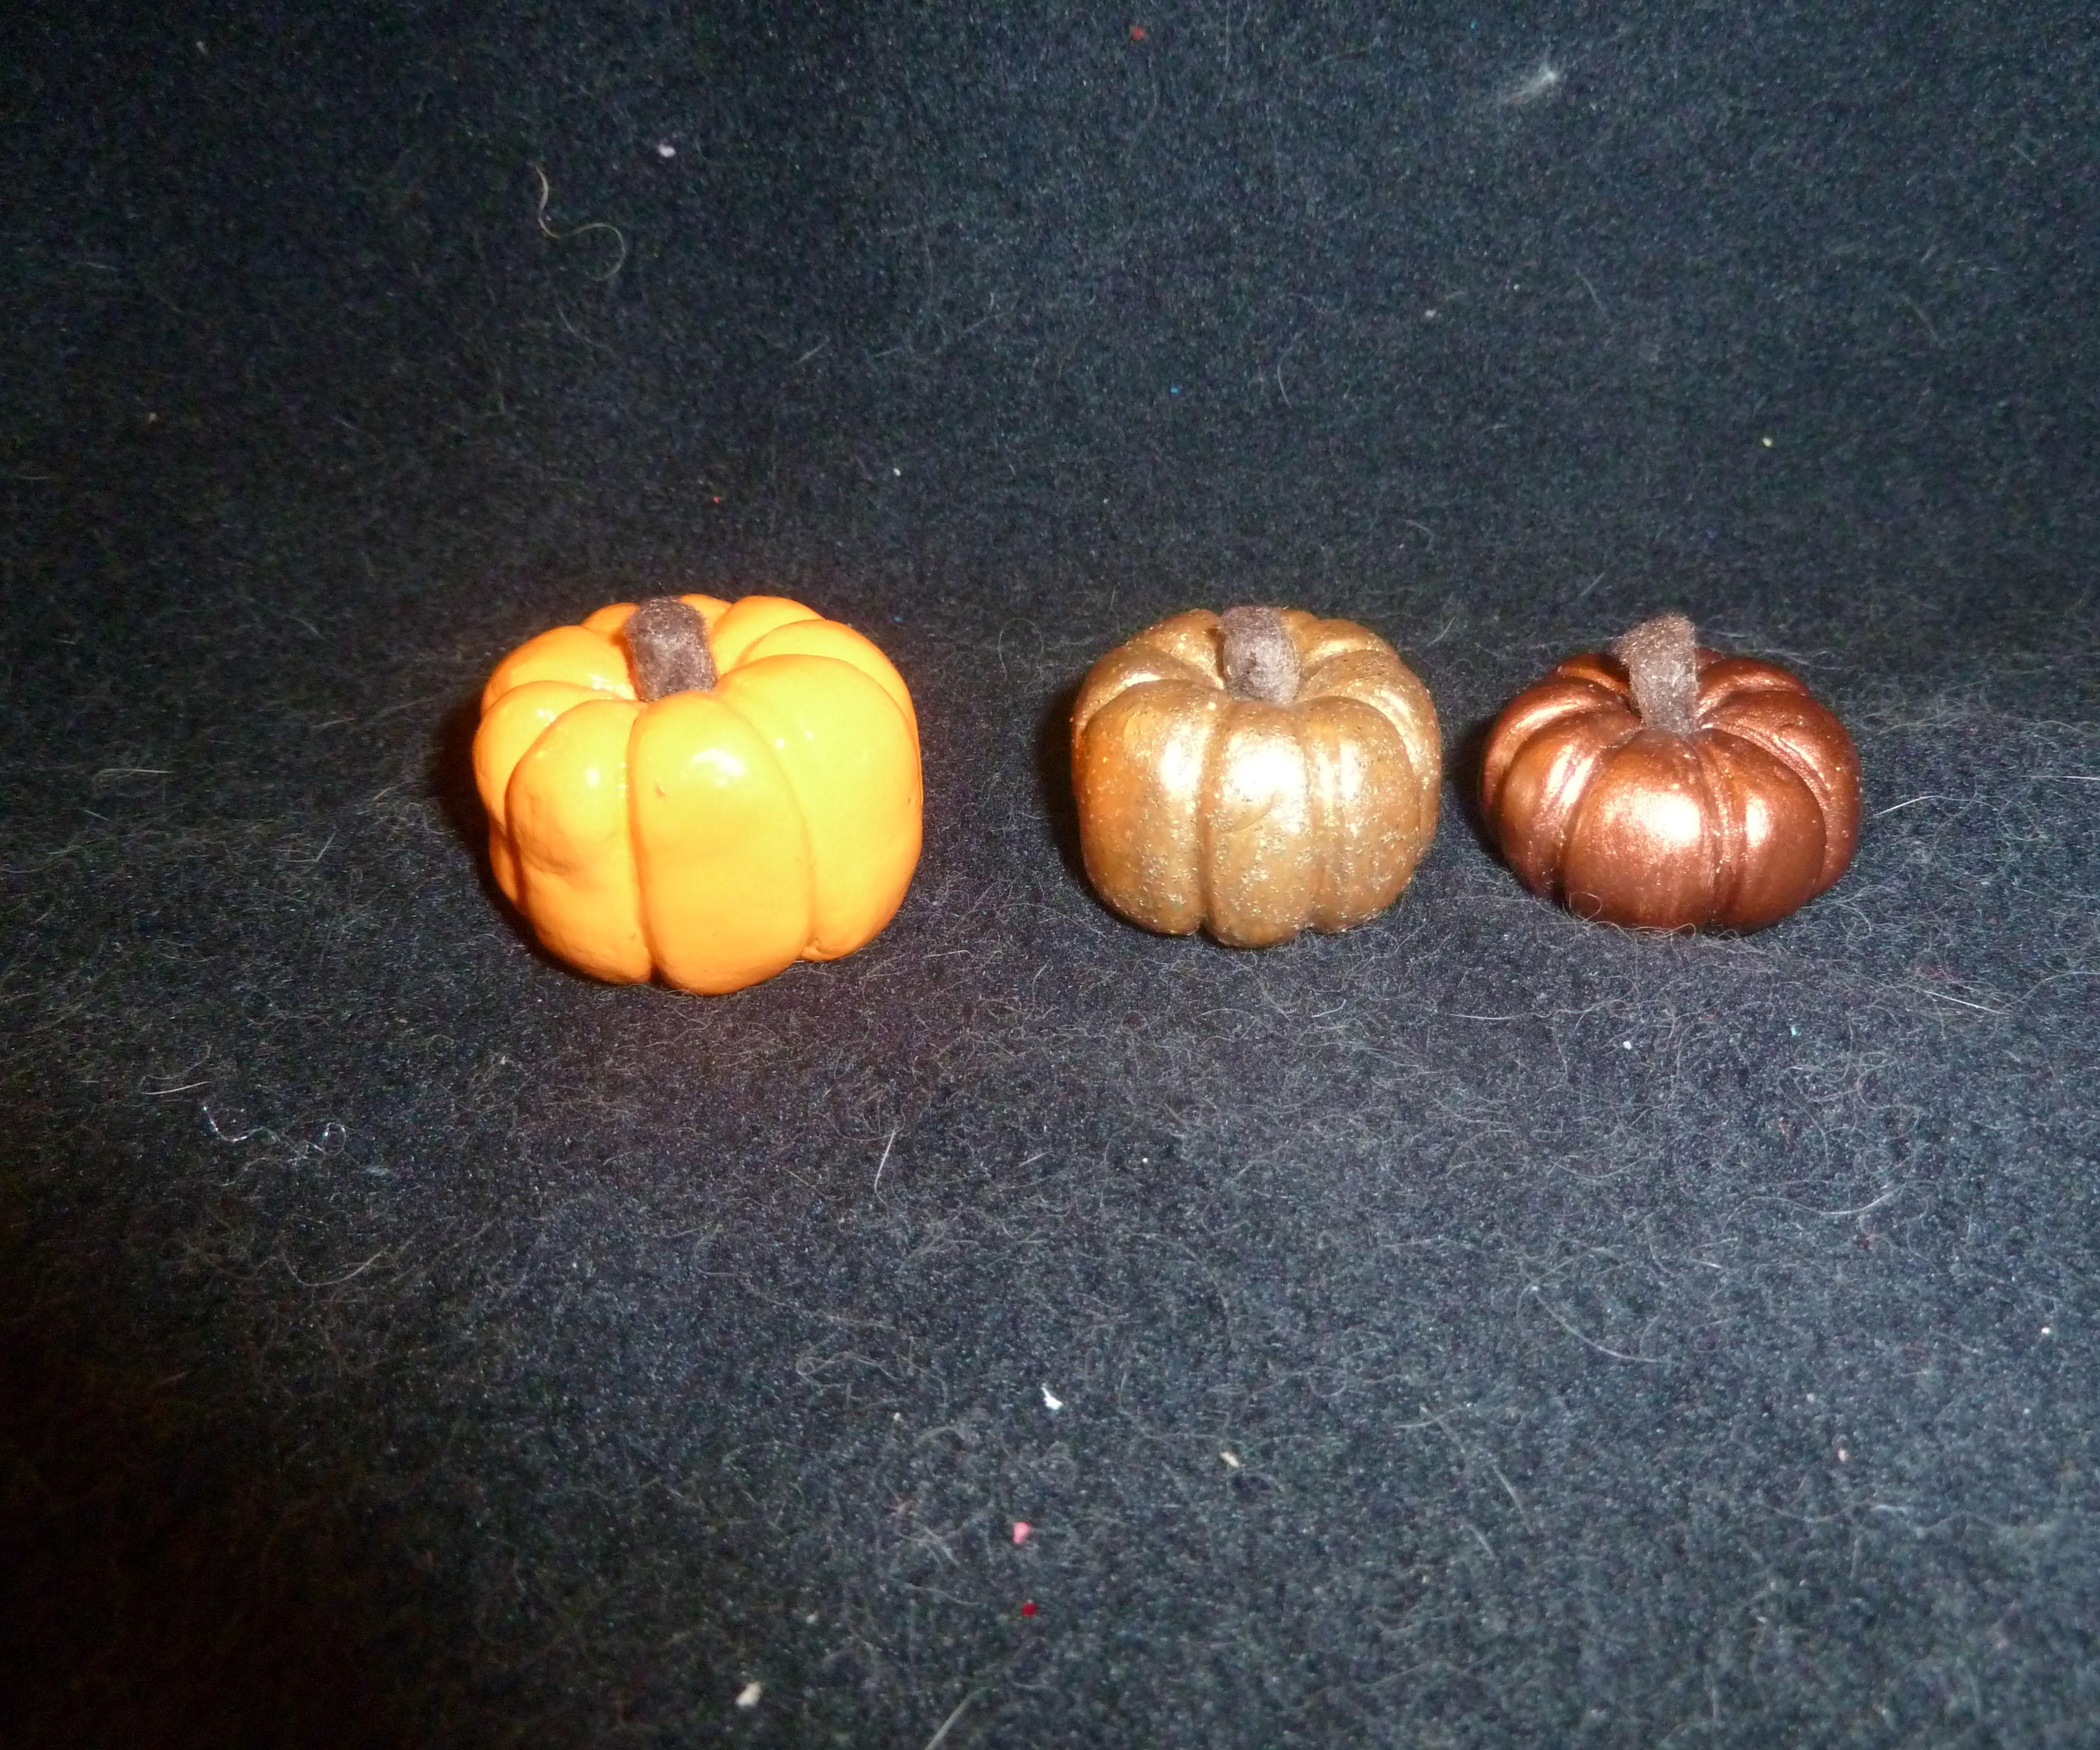 DIY: Clay Pumpkins